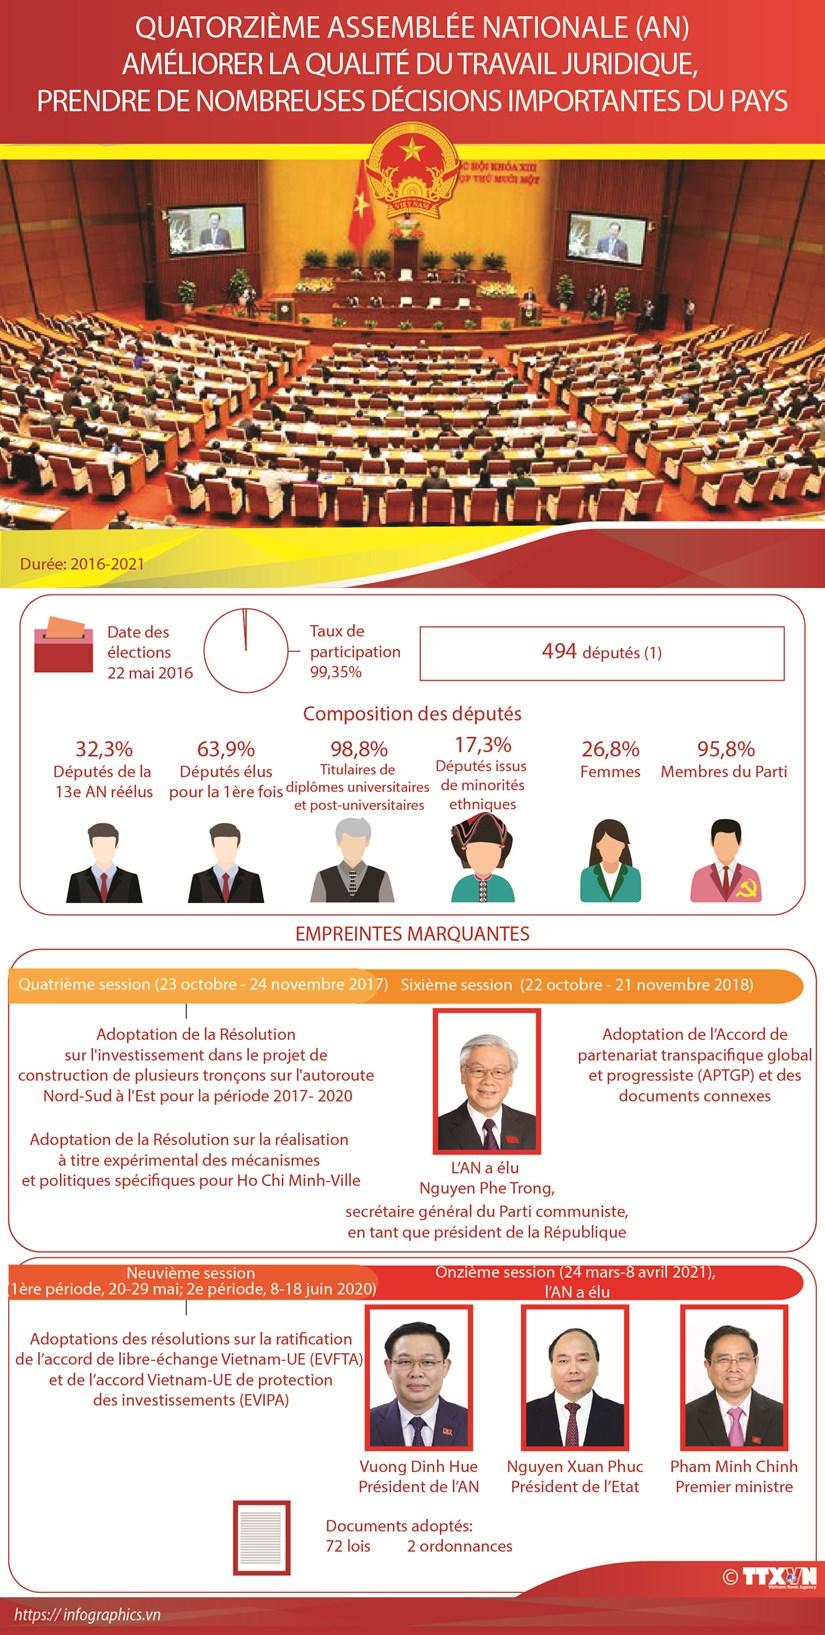 Quatorzieme Assemblee nationale du Vietnam hinh anh 1